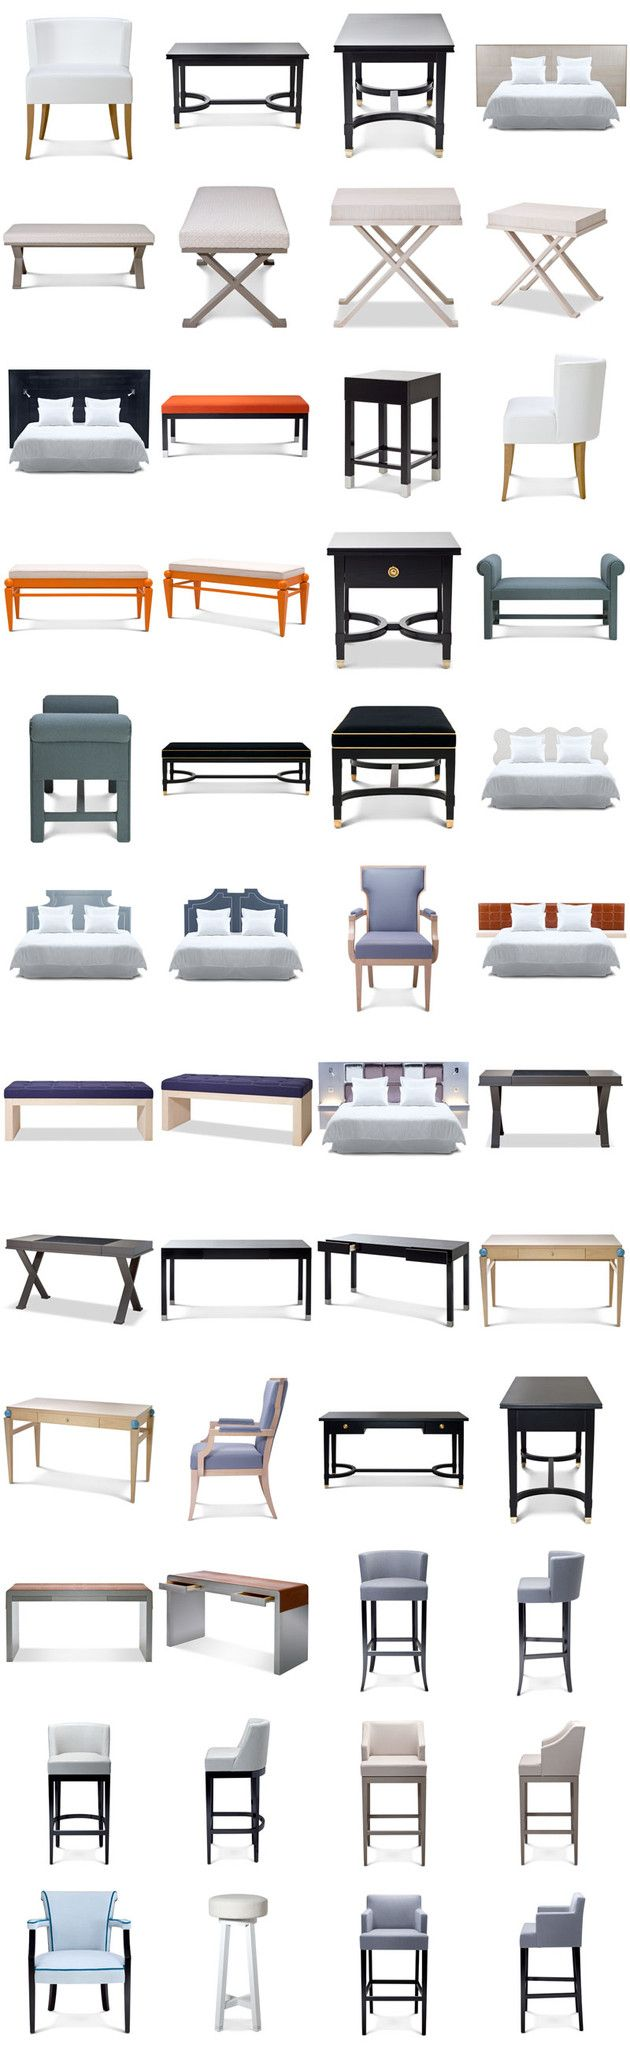 Photoshop Psd Sofa Blocks Best Collection Cad Design